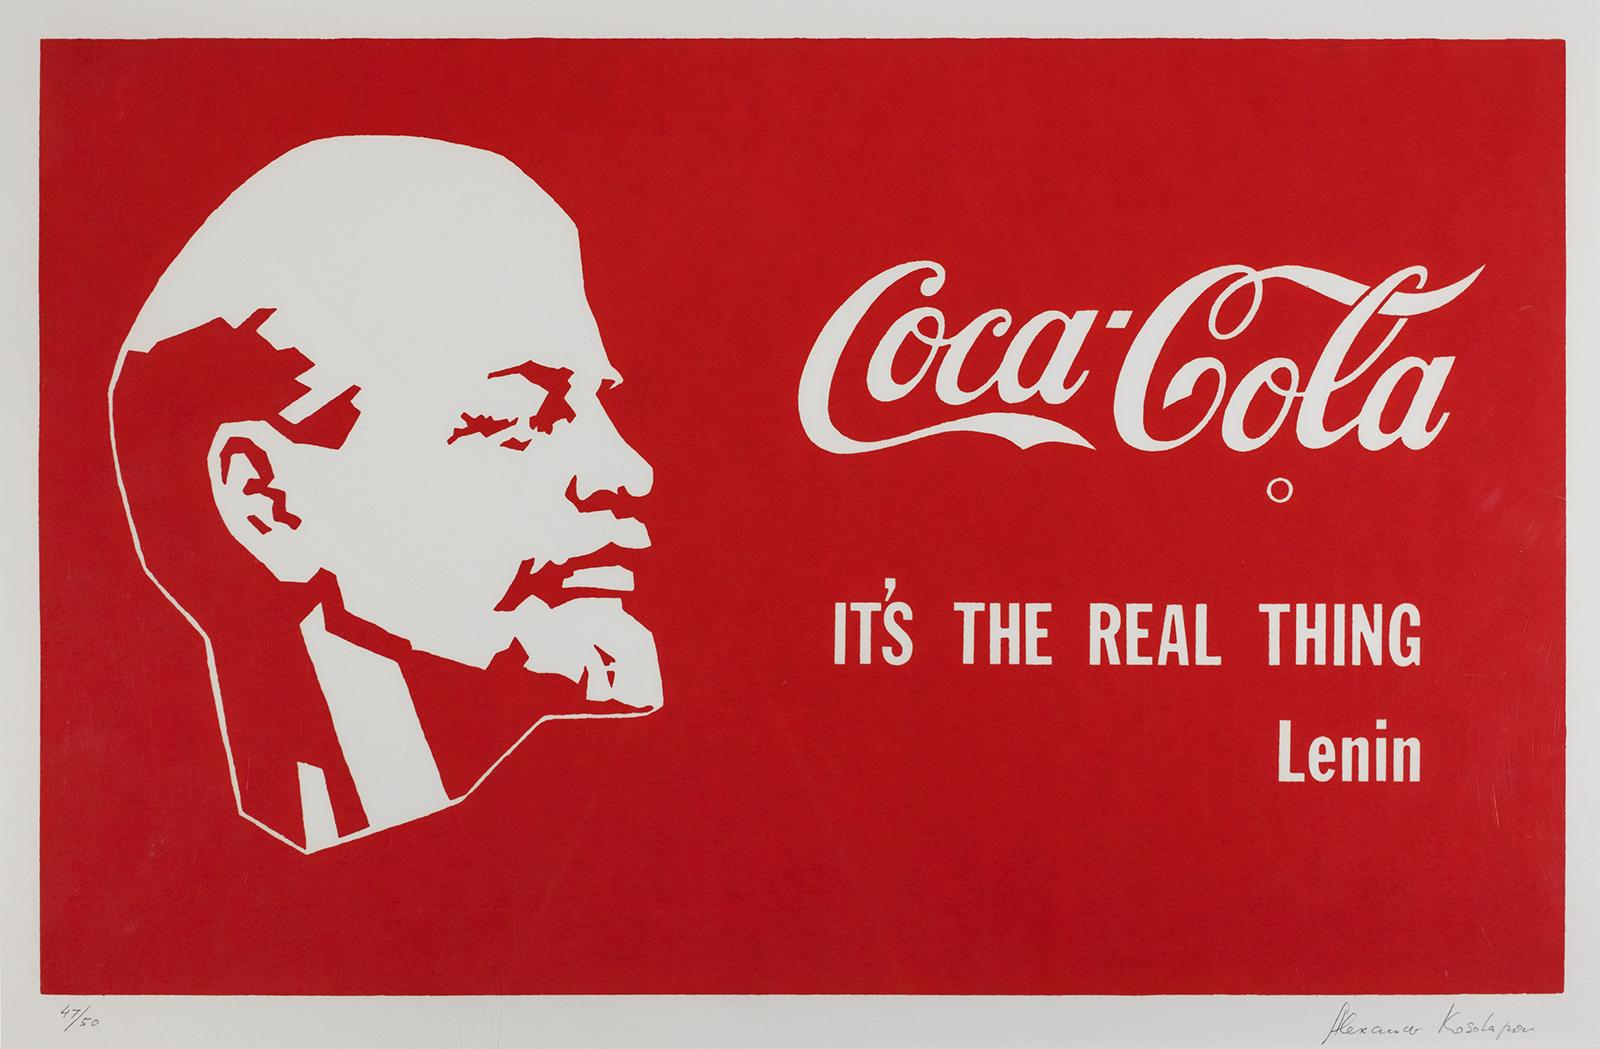 Alexander Kosolapov, Lenin Coca-Cola, 1982